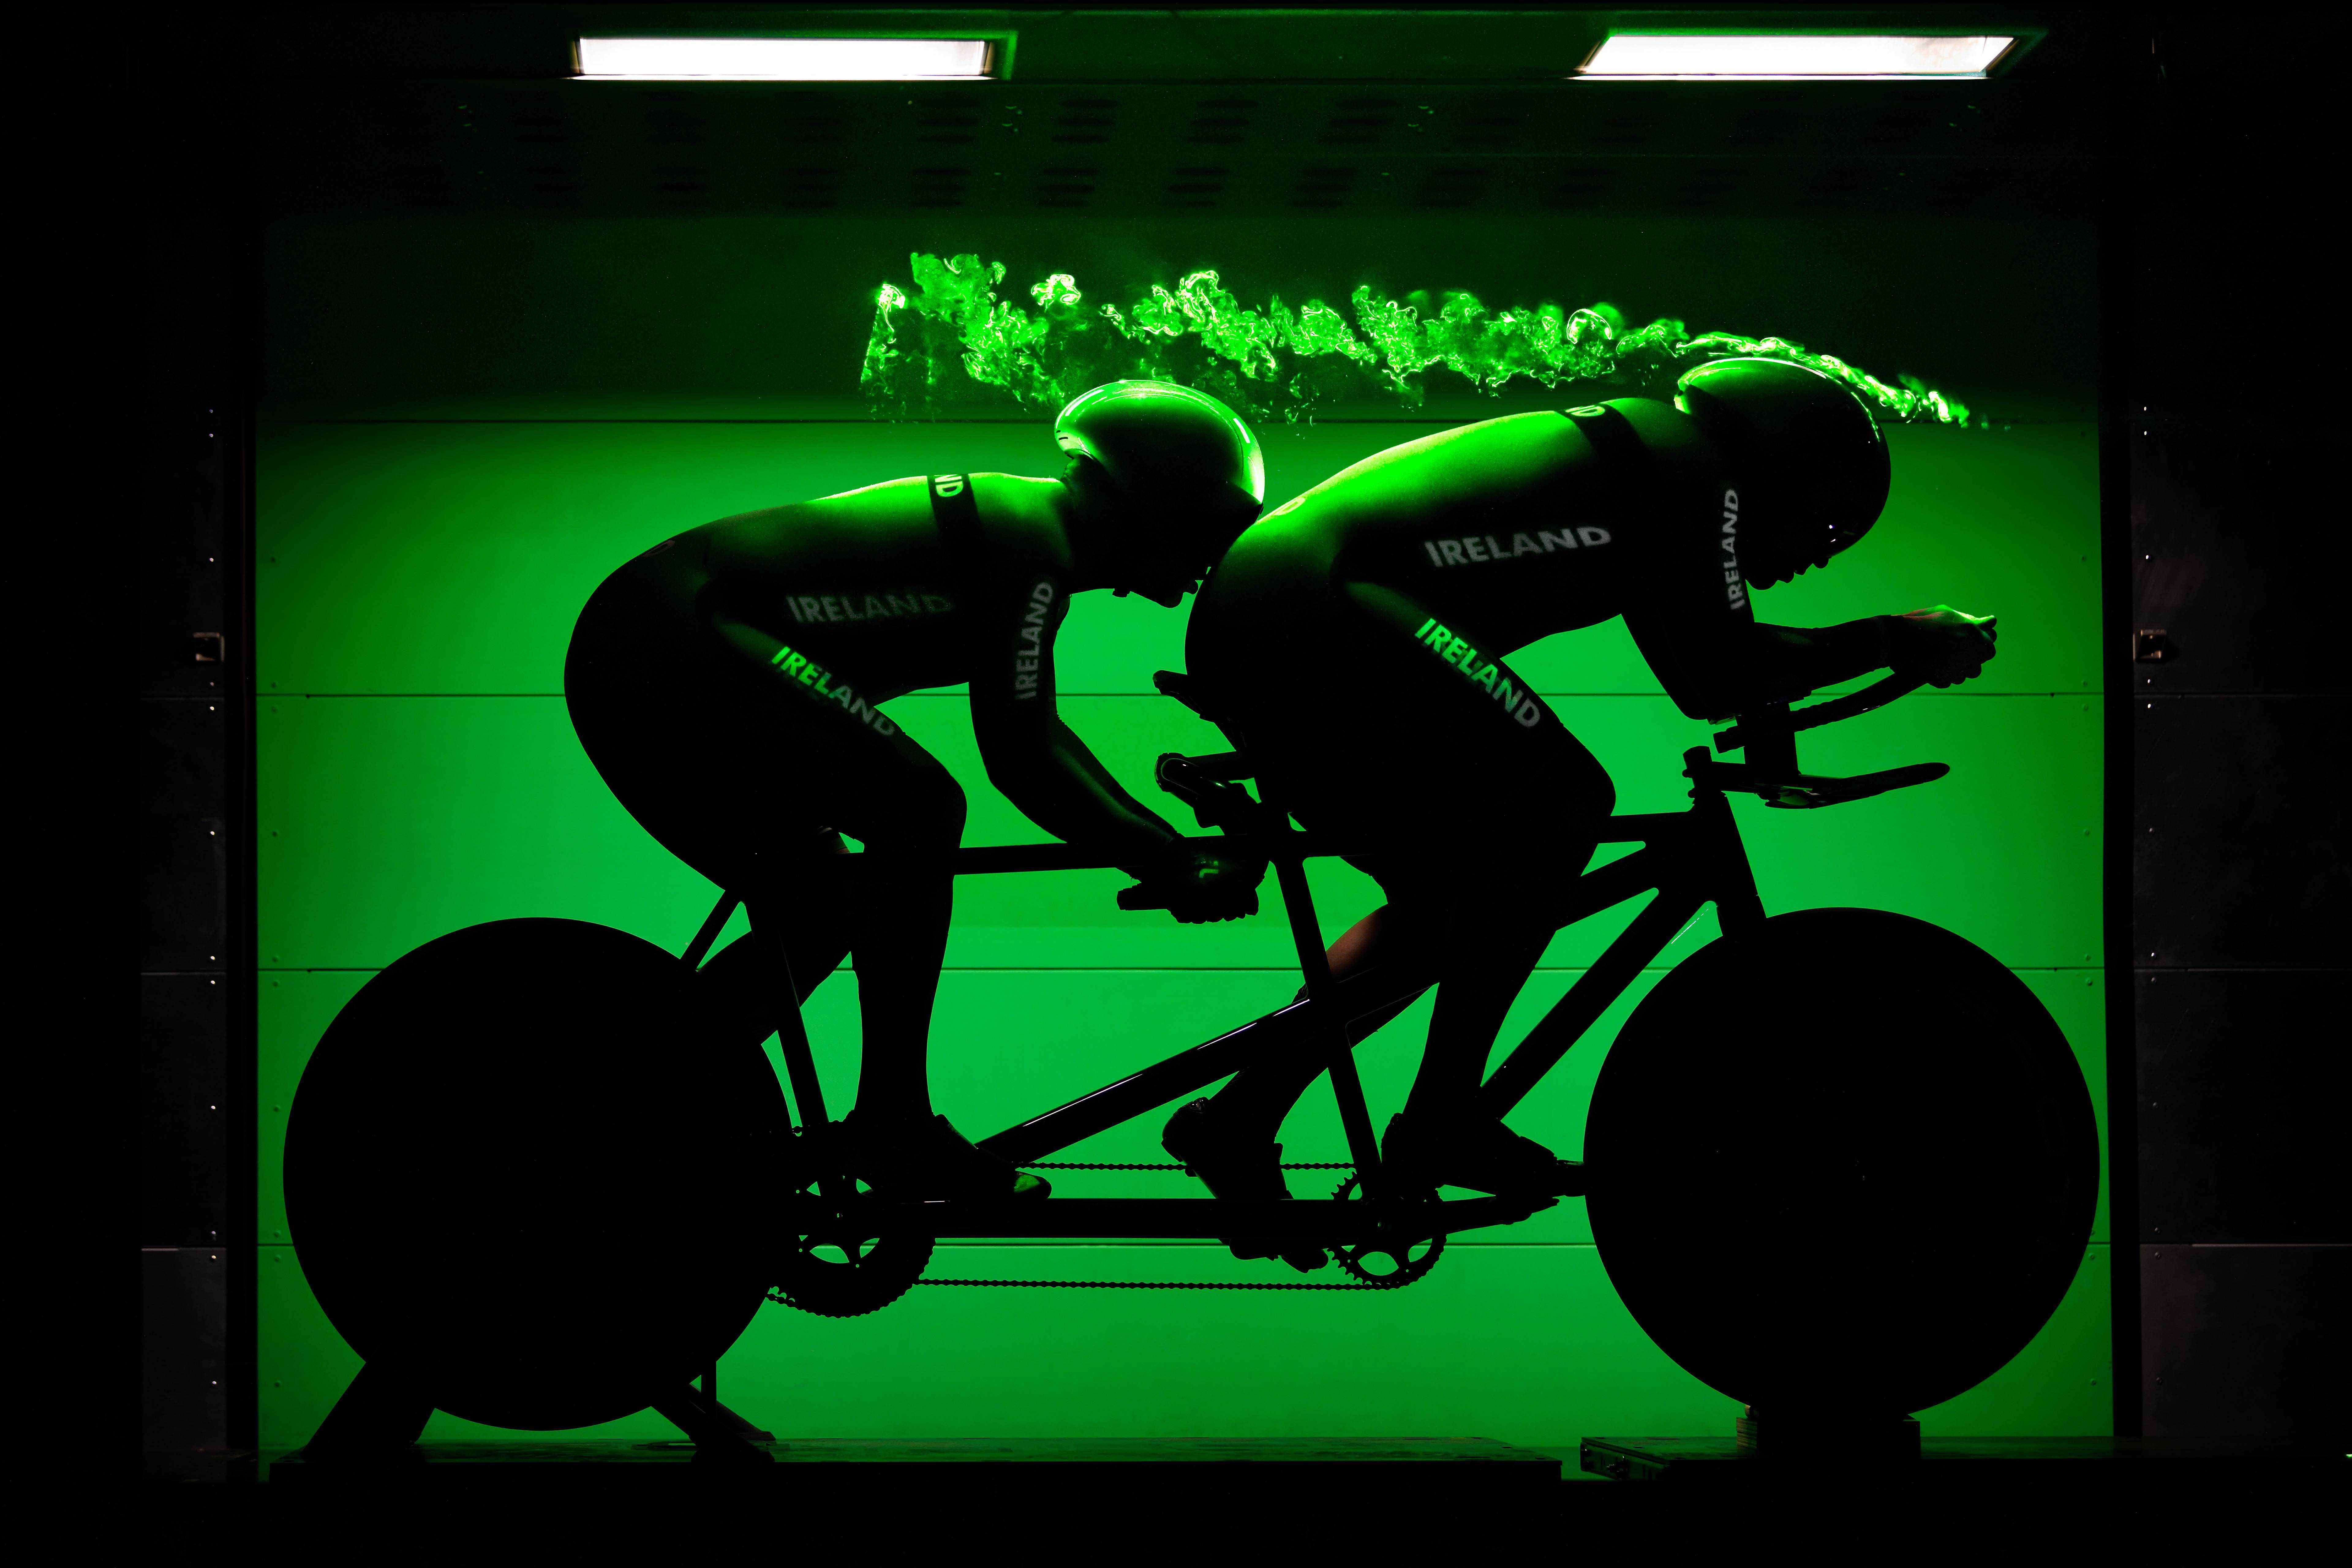 paracycling aerodynamics